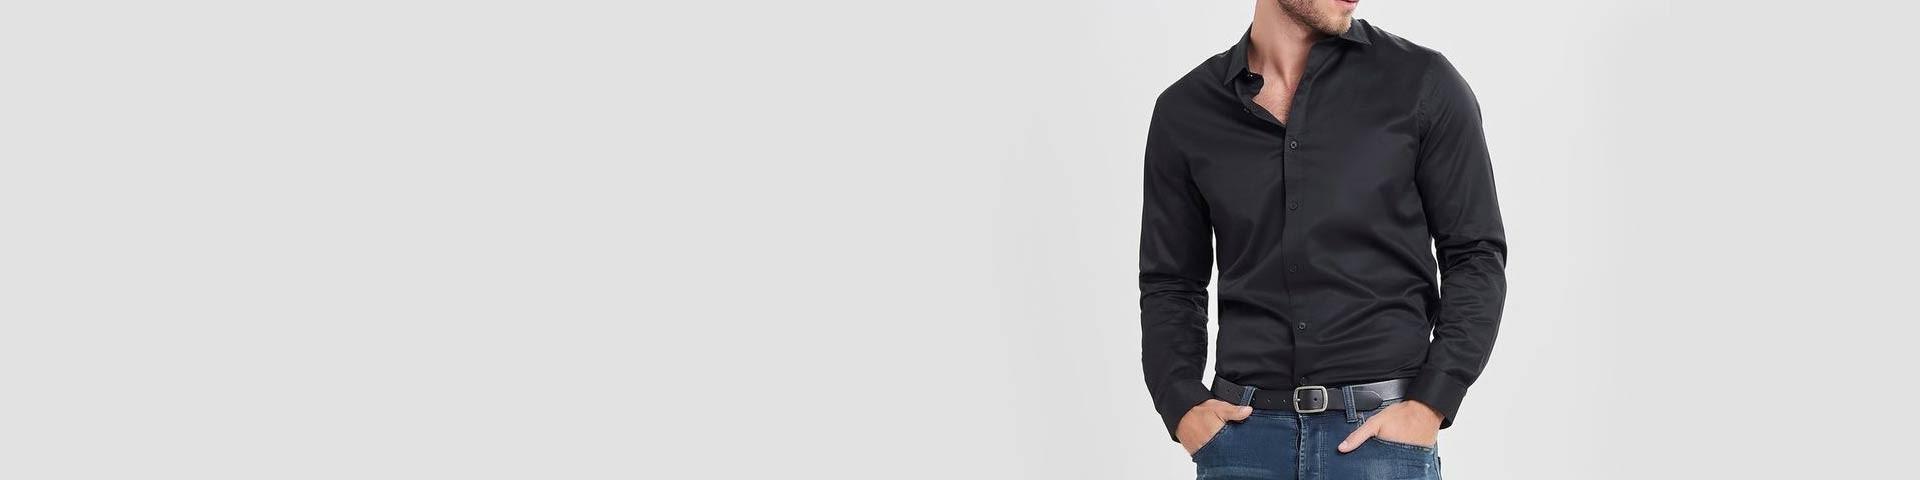 Camisas de hombre – Online Closer - Tu marca de ropa de moda